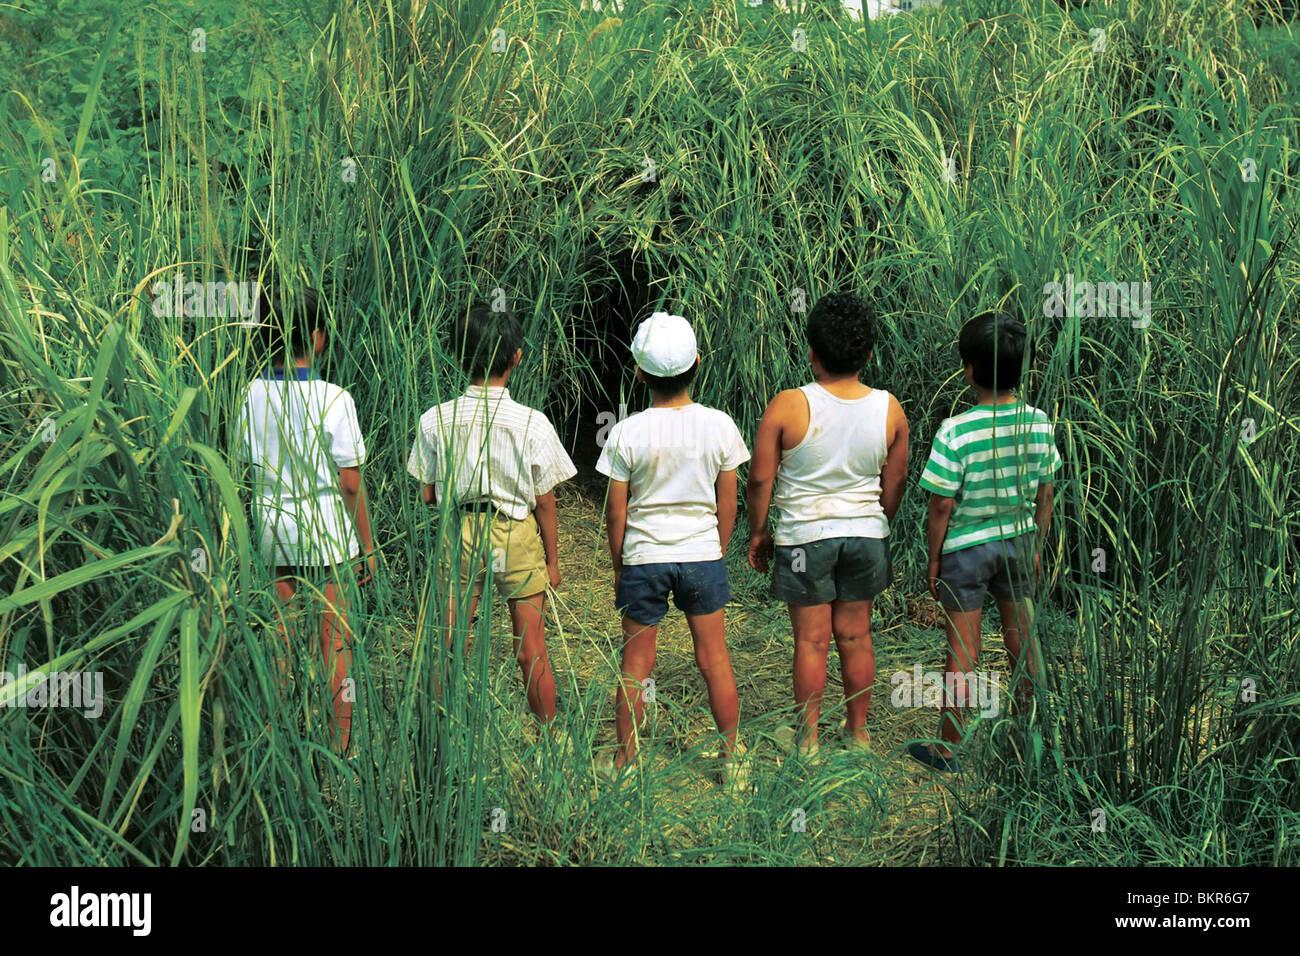 20-SEIKI SHONEN (2008) 20E SIÈCLE LES GARÇONS (ALT) YUKIHIKO TSUTSUMI (DIR) 001 Photo Stock